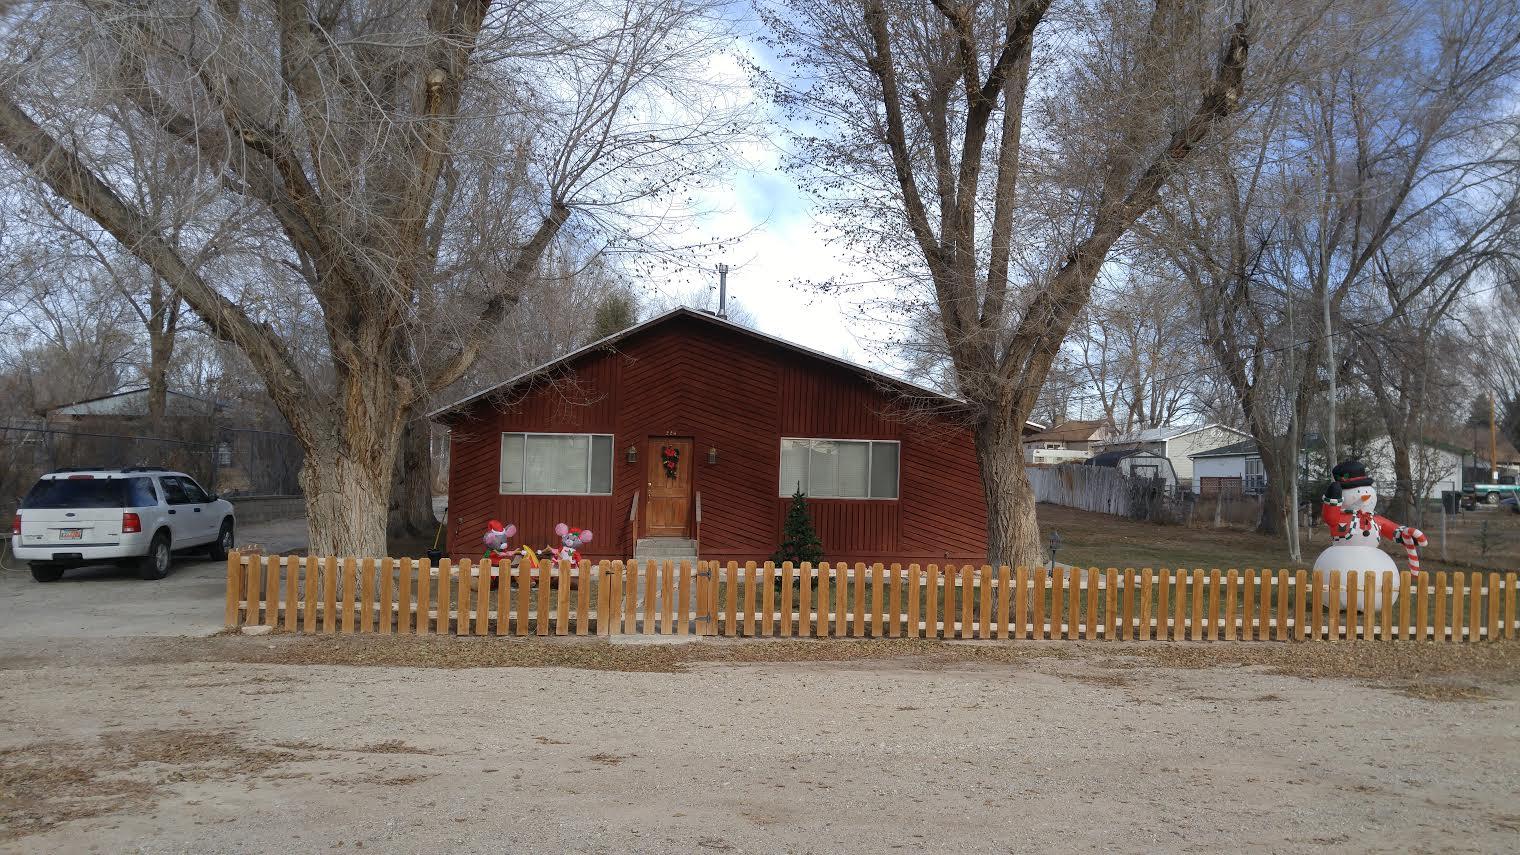 226 WEST 100 SOUTH, Gunnison, Utah 84634